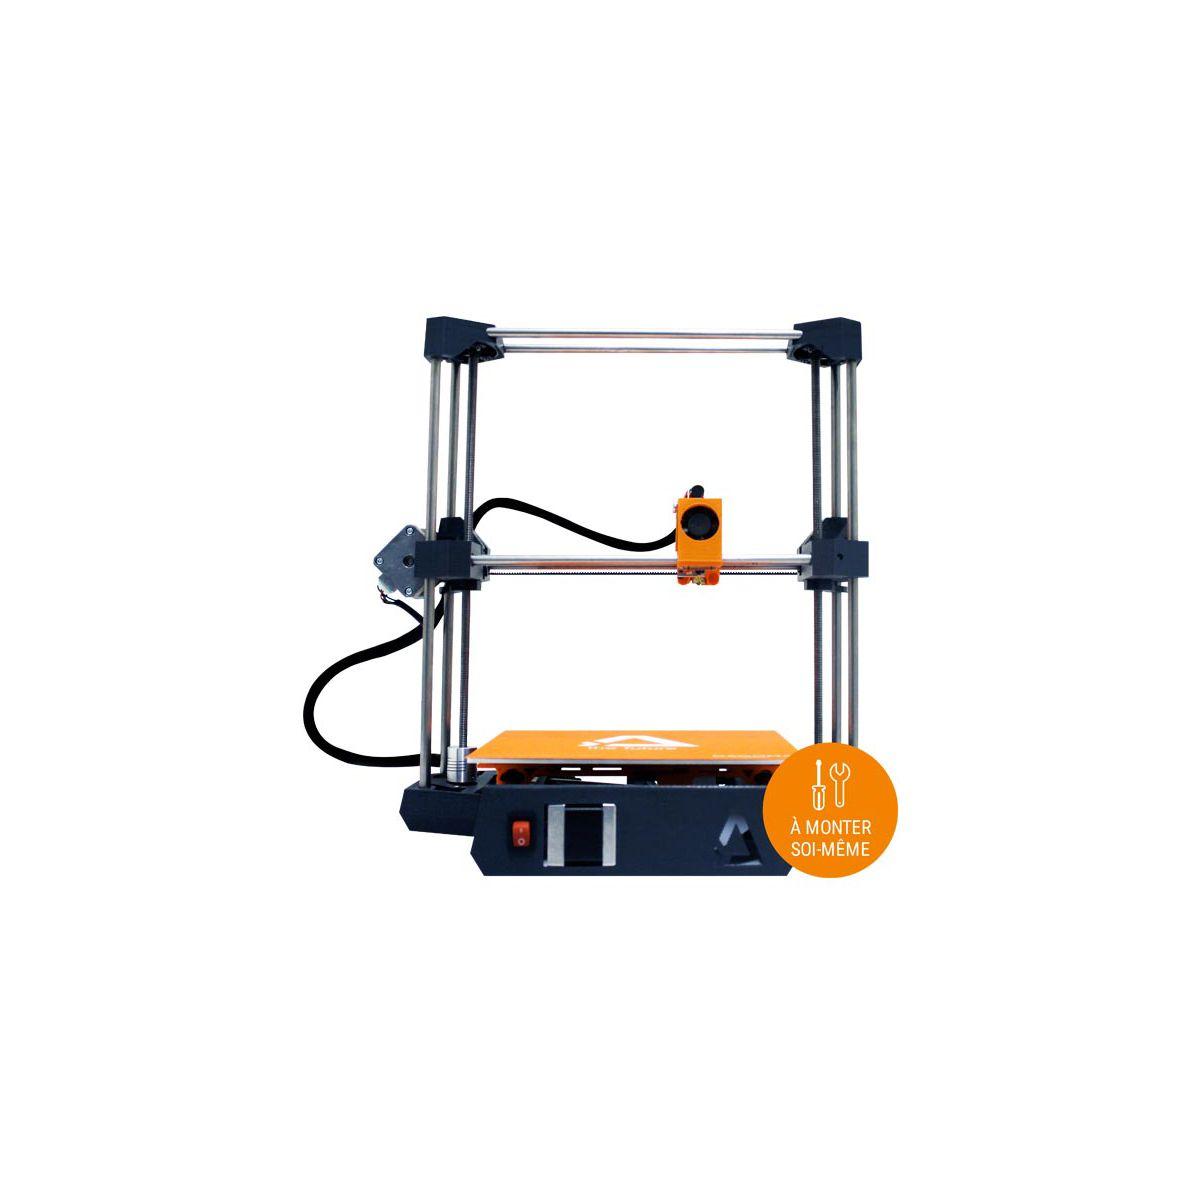 Imprimante 3D DAGOMA Discovery 200 kit (photo)